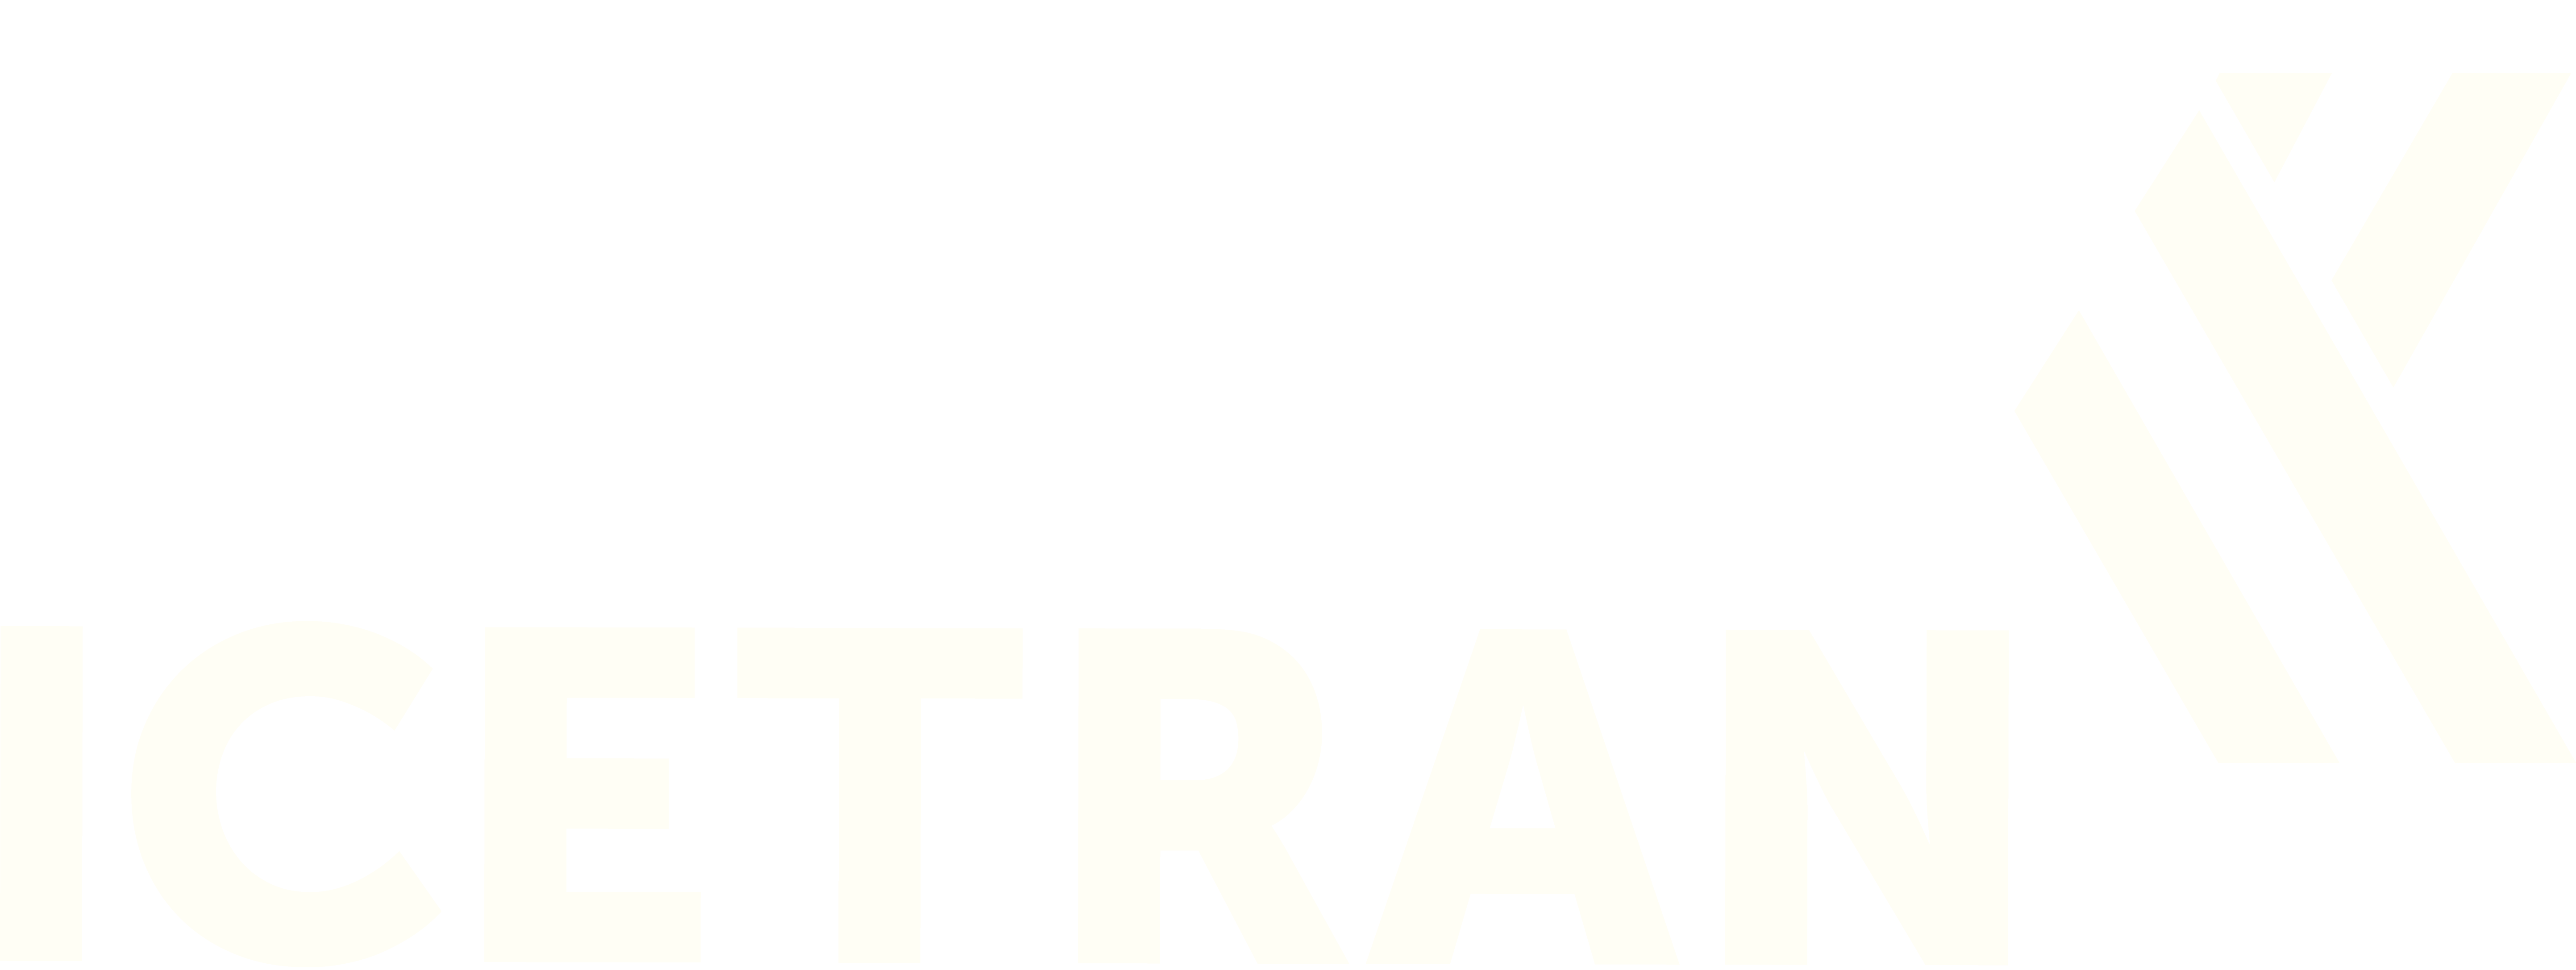 Icetran